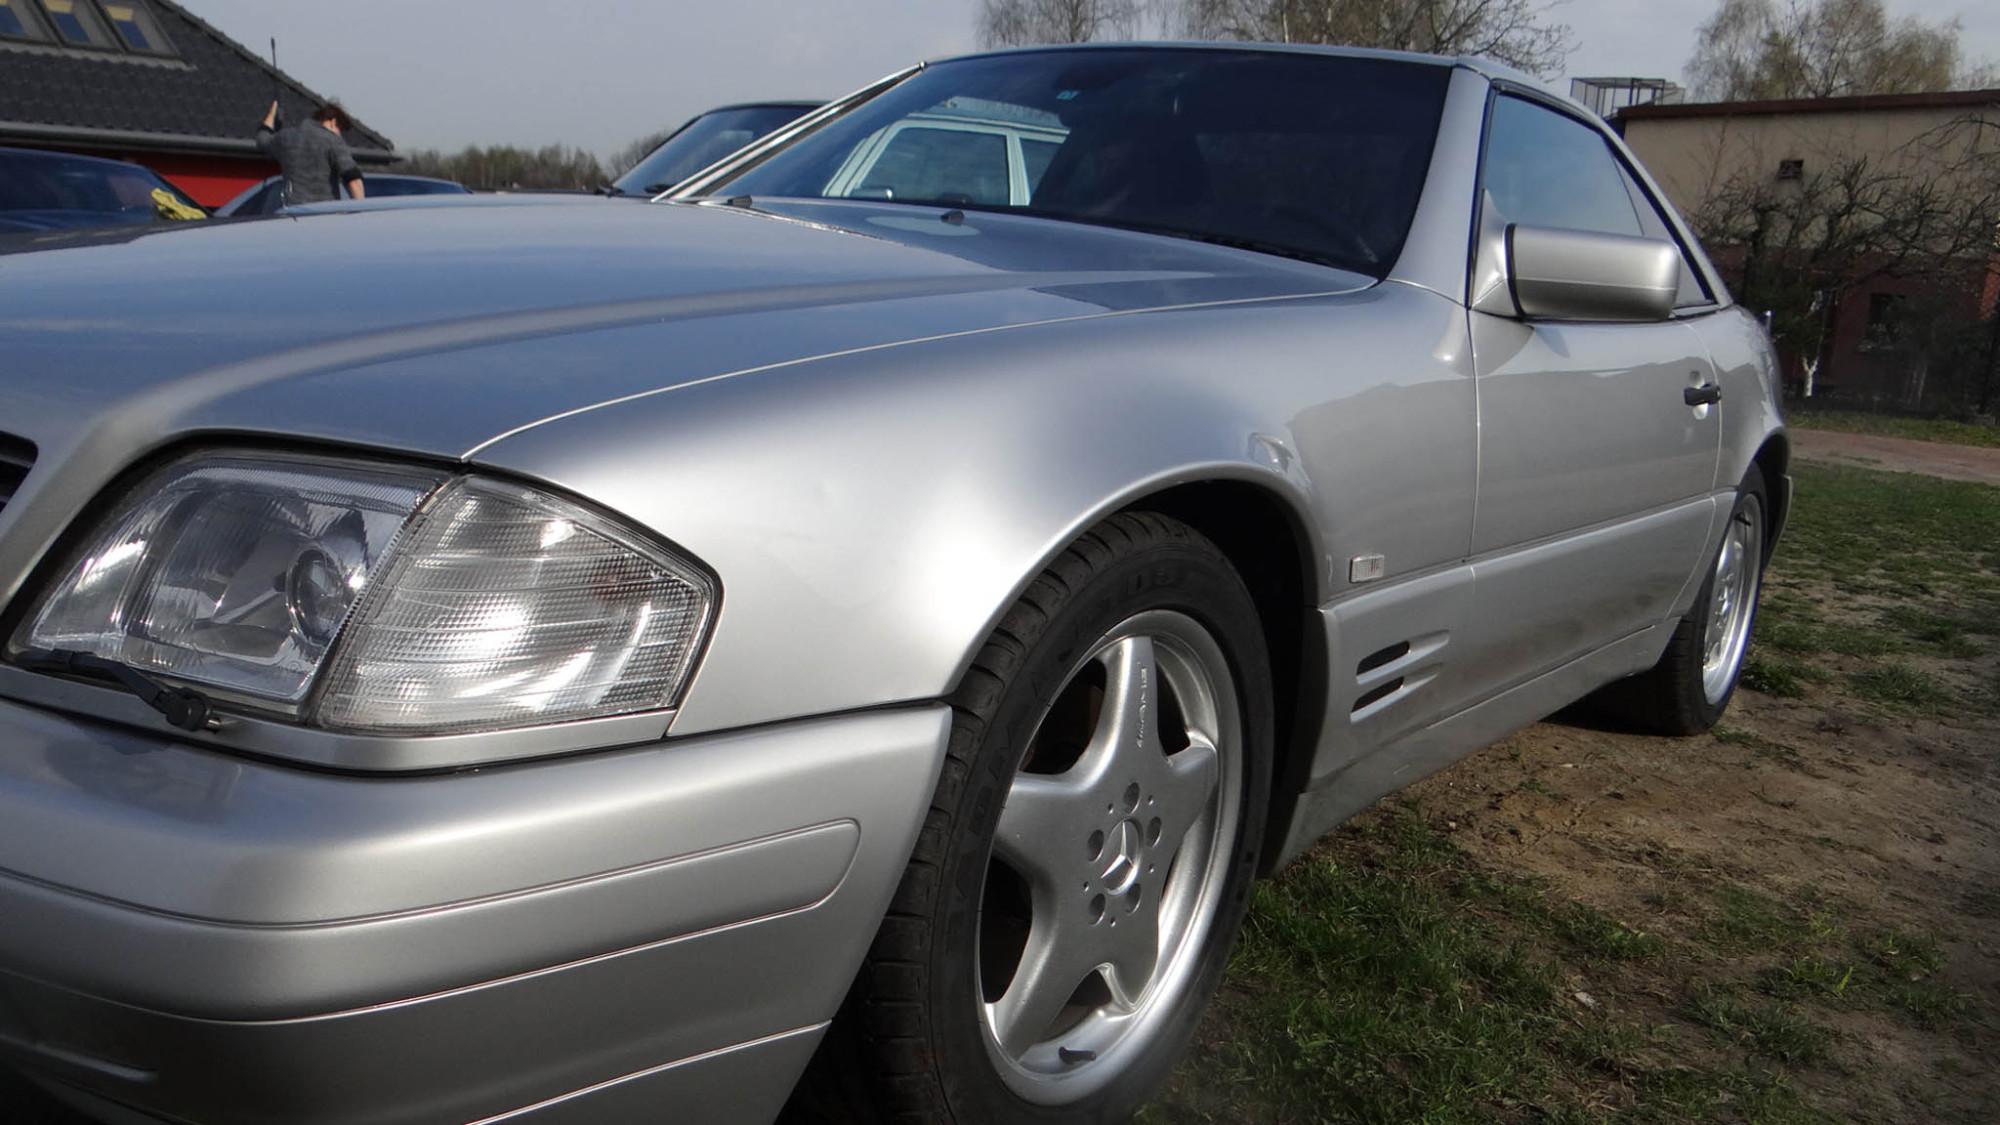 39 97 mercedes benz sl 500 nowex cars for 97 mercedes benz